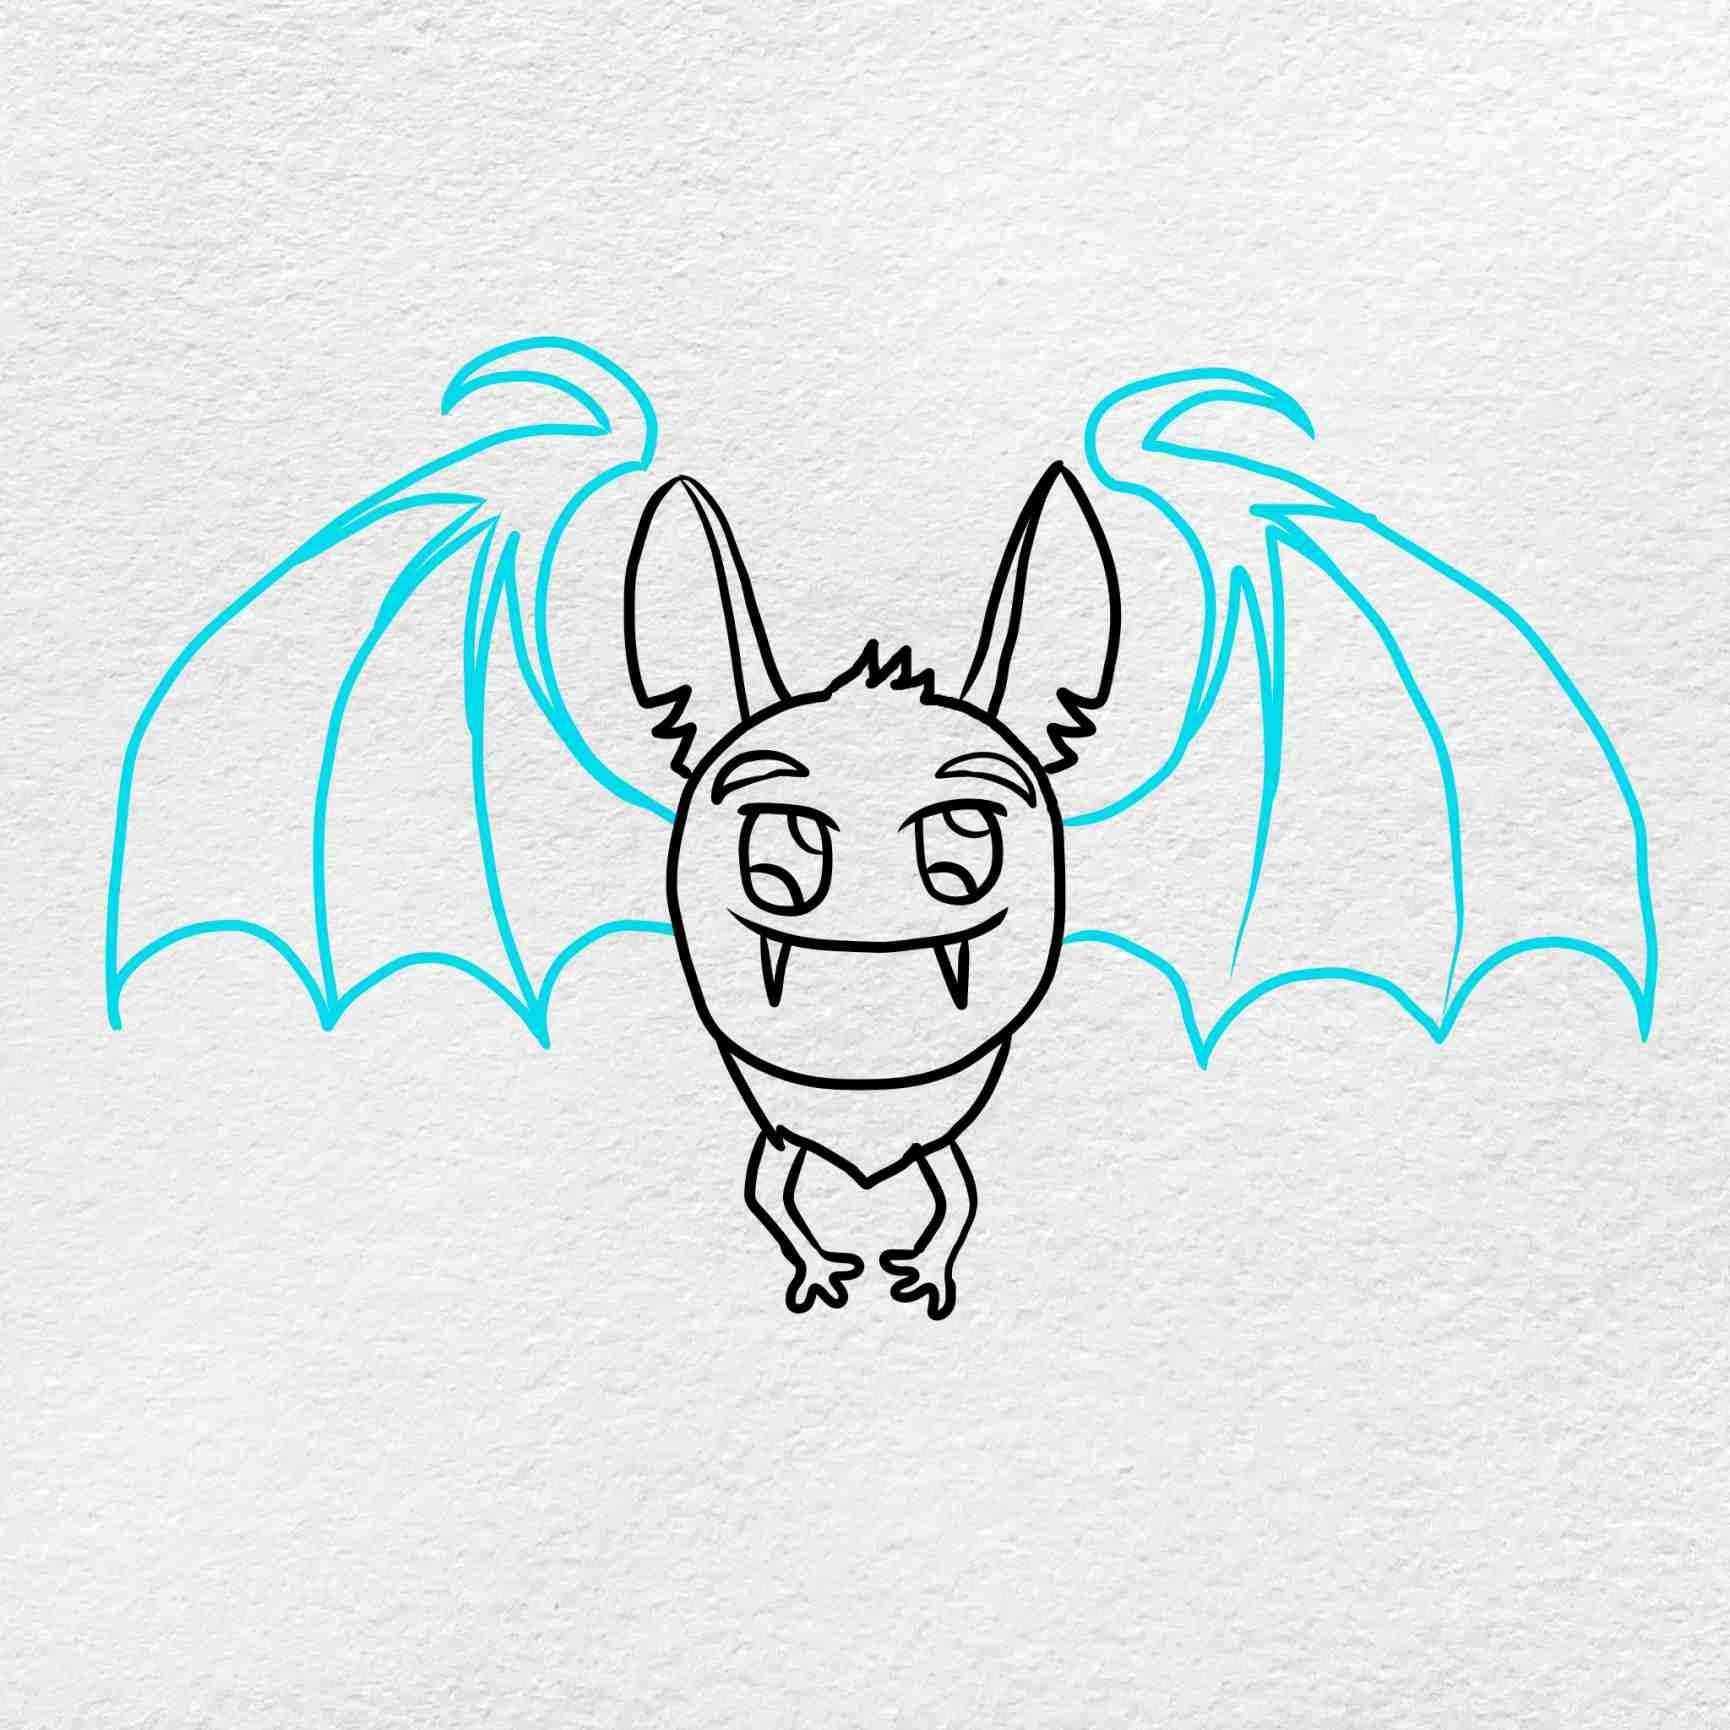 Halloween Bat Drawing: Step 5